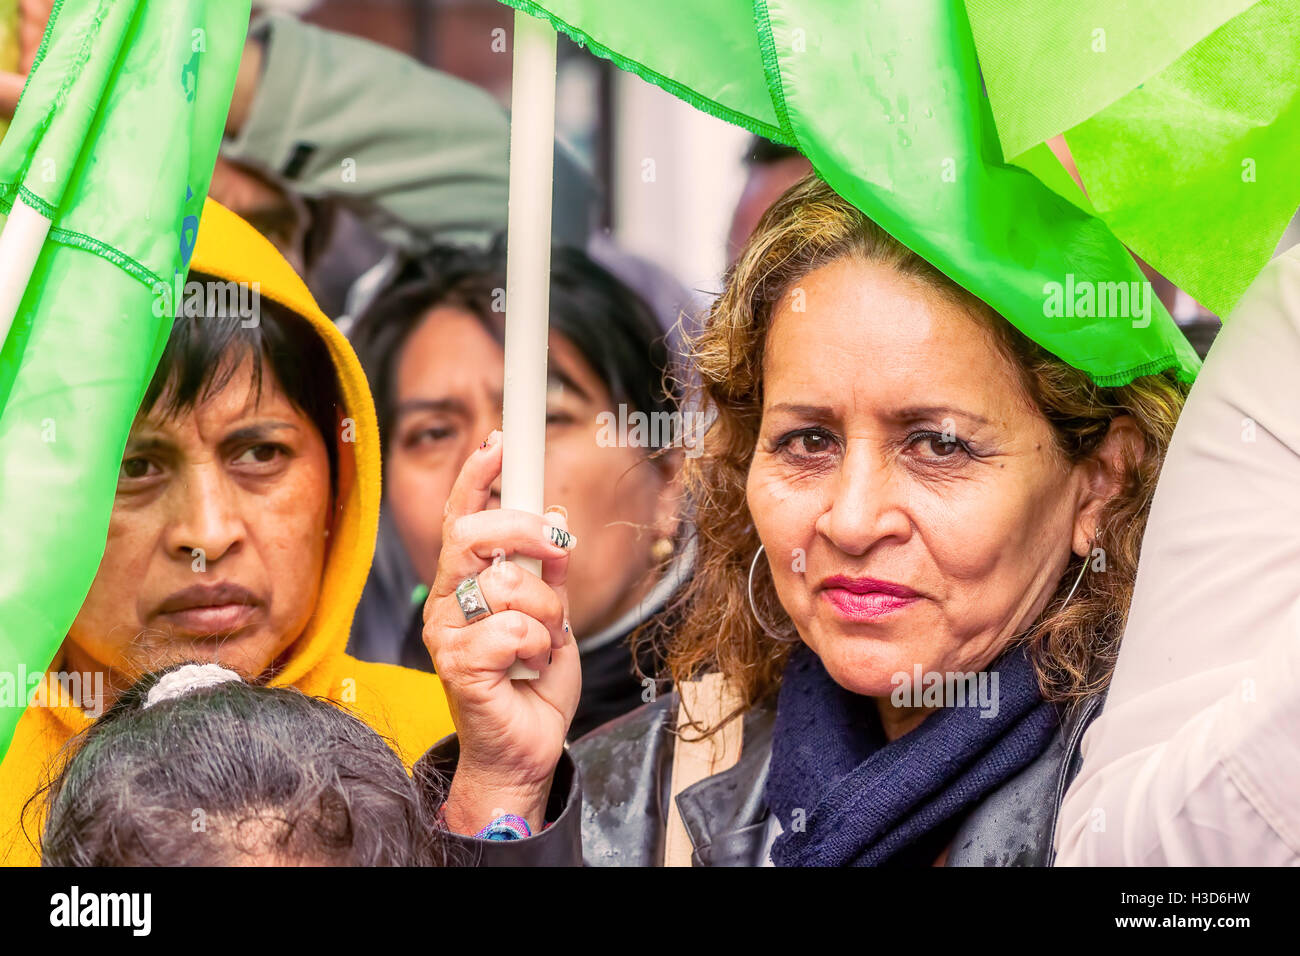 Banos De Agua Santa, Ecuador - 23 June, 2016: Crowd Gathered In The Center Of Banos De Agua Santa For The Ecuadorian - Stock Image